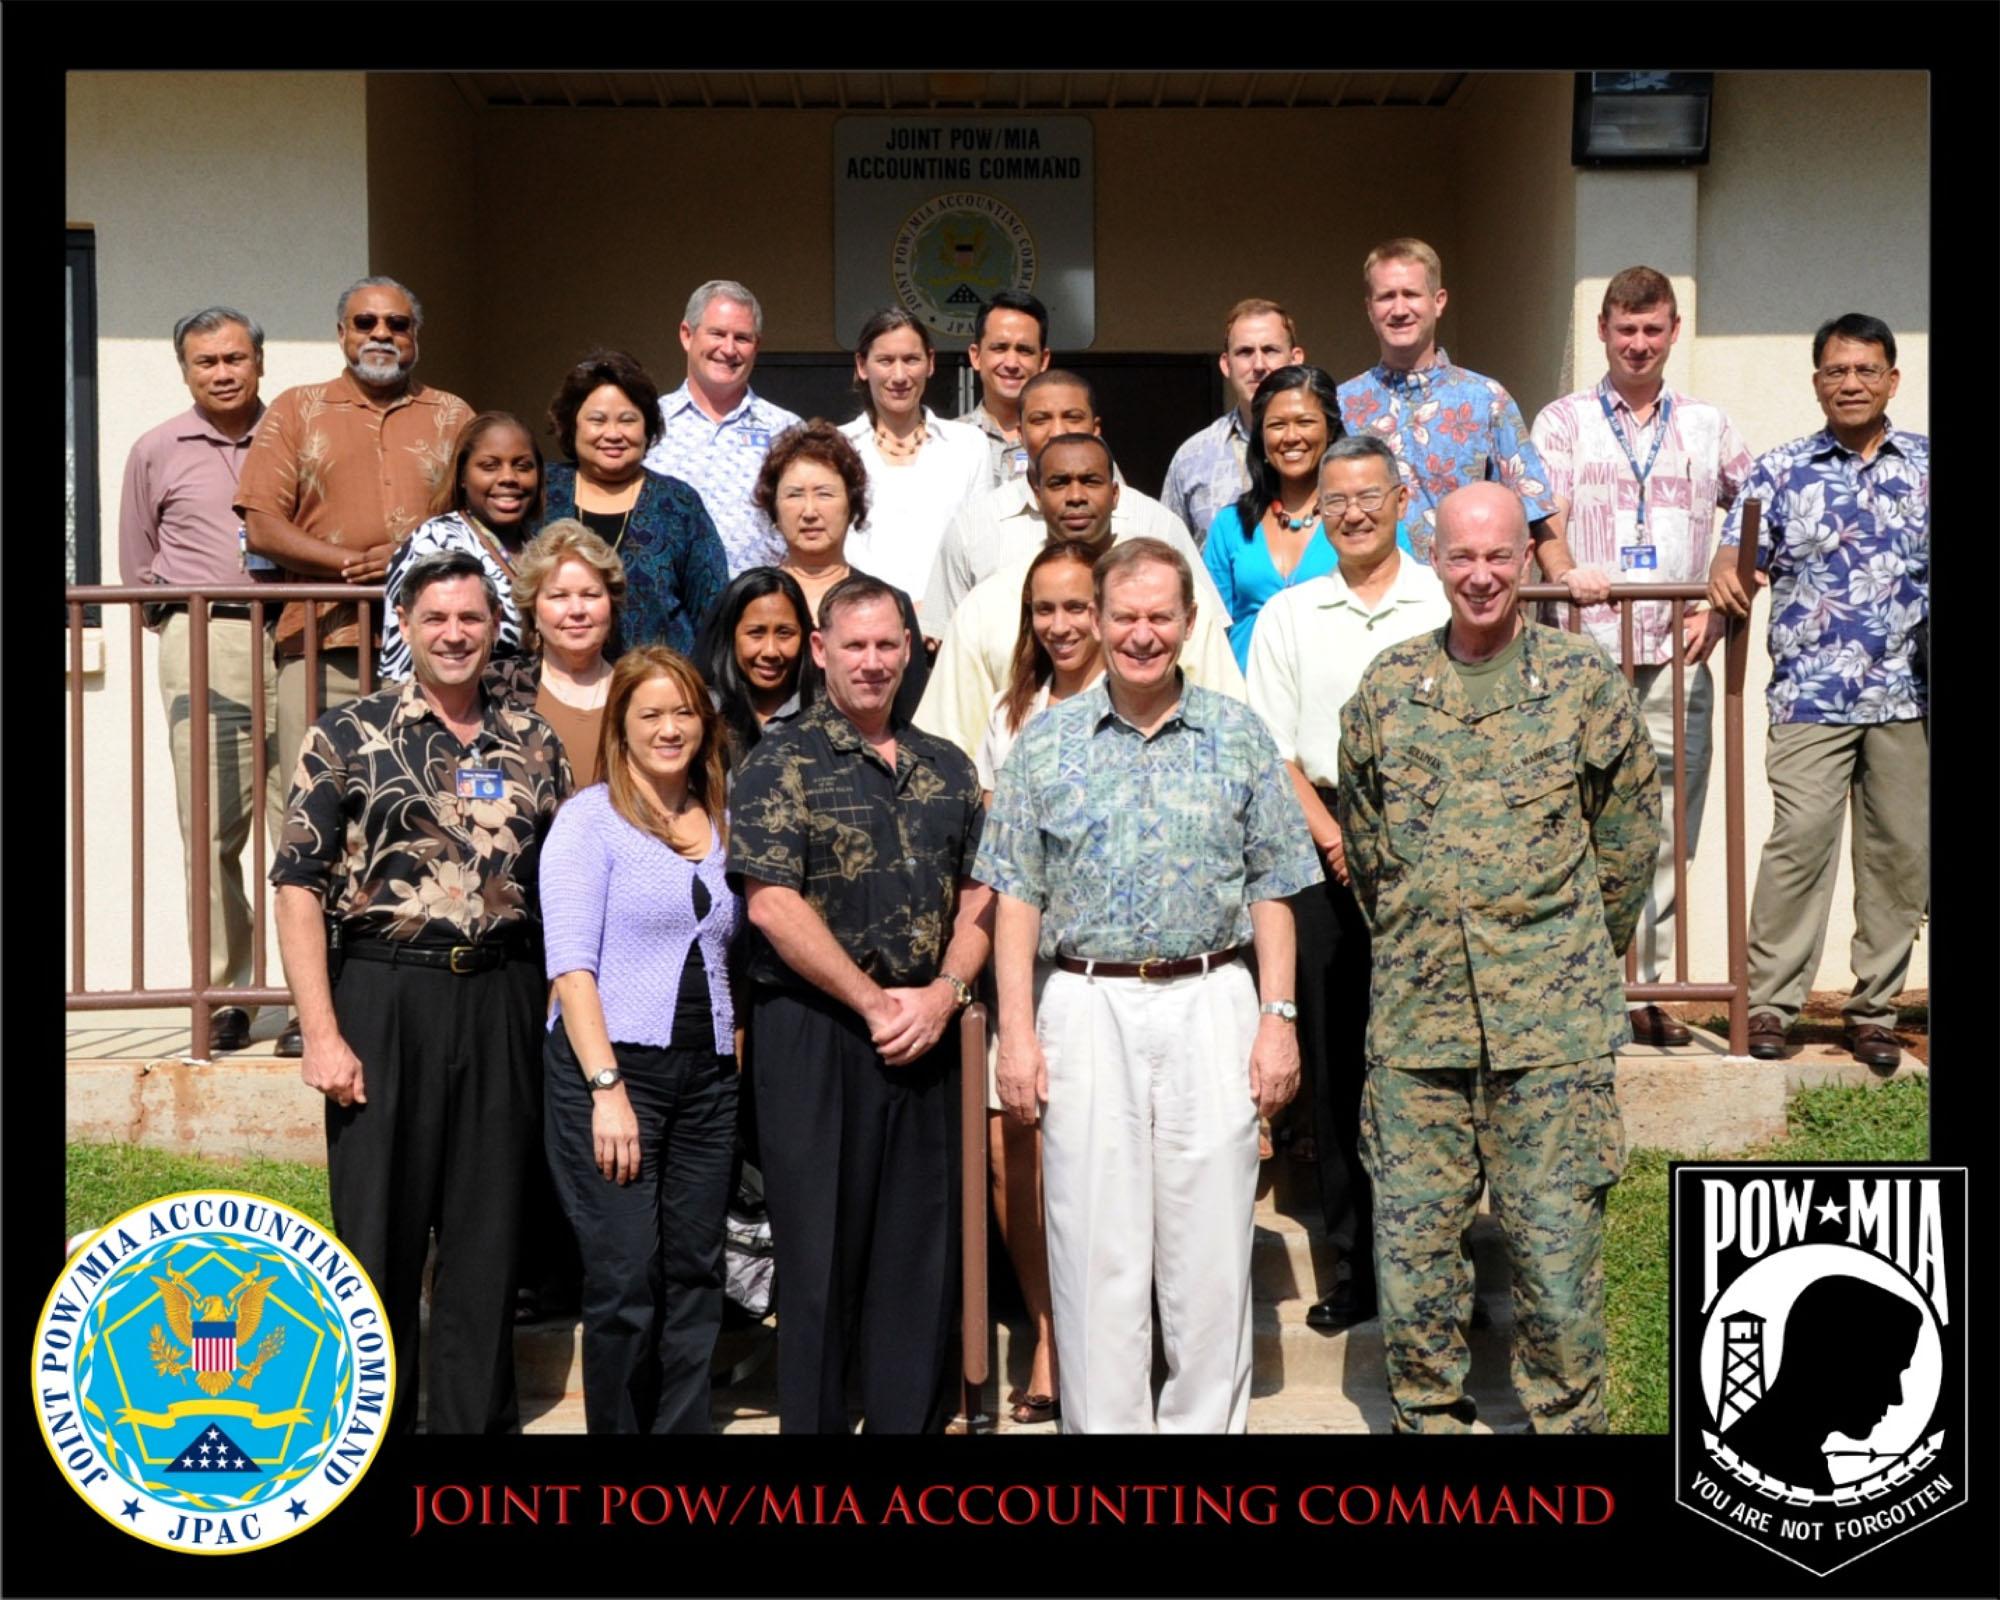 Hawaii Accountingfinance Craigslist Apcss' 'professional Development Series' Visits Jpac